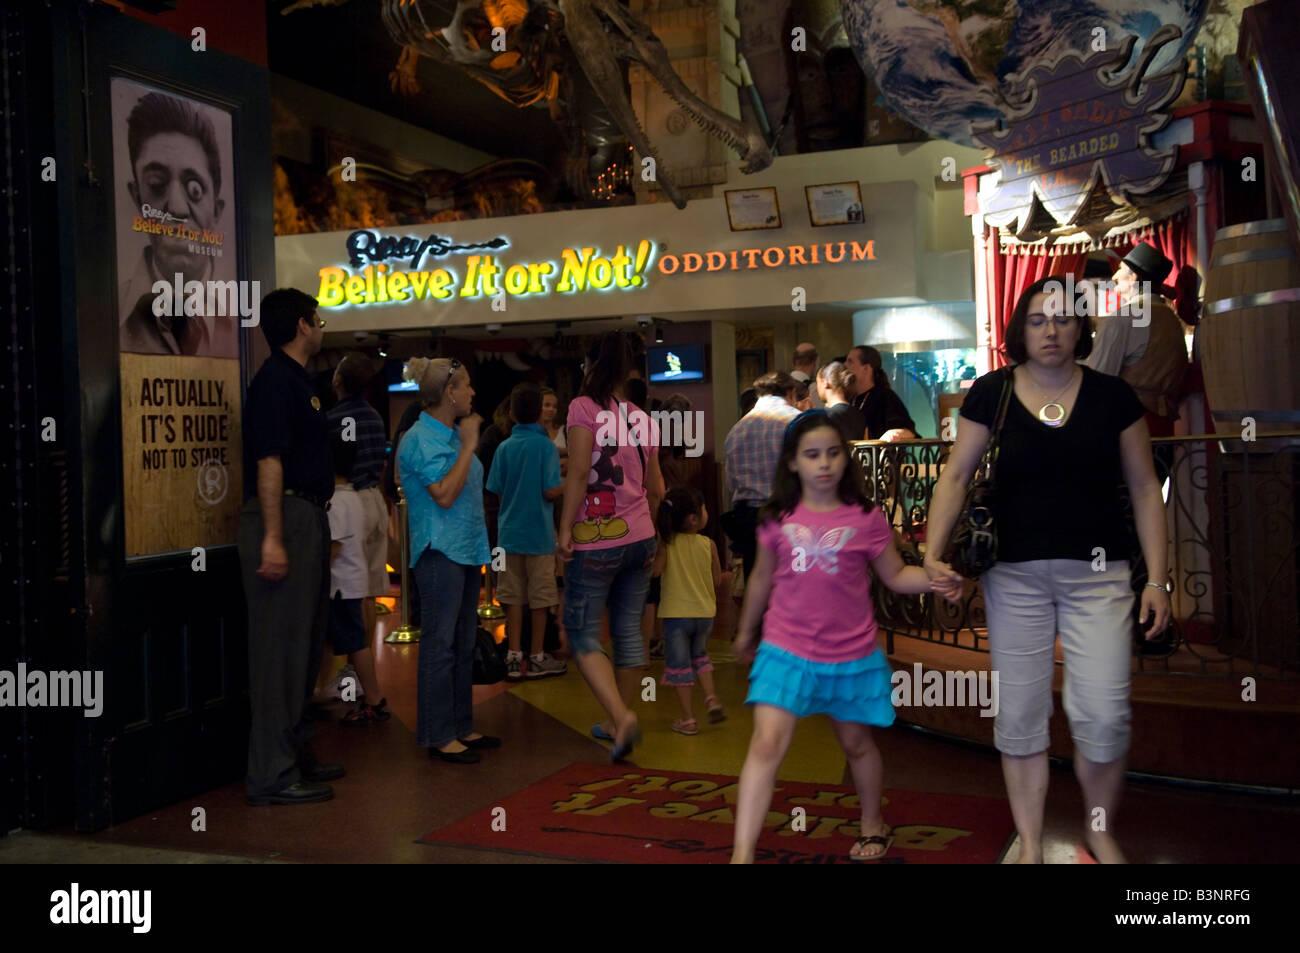 Ripley s Believe It or Not Odditorium dans Times Square le 20 août 2008 Frances M Roberts Photo Stock